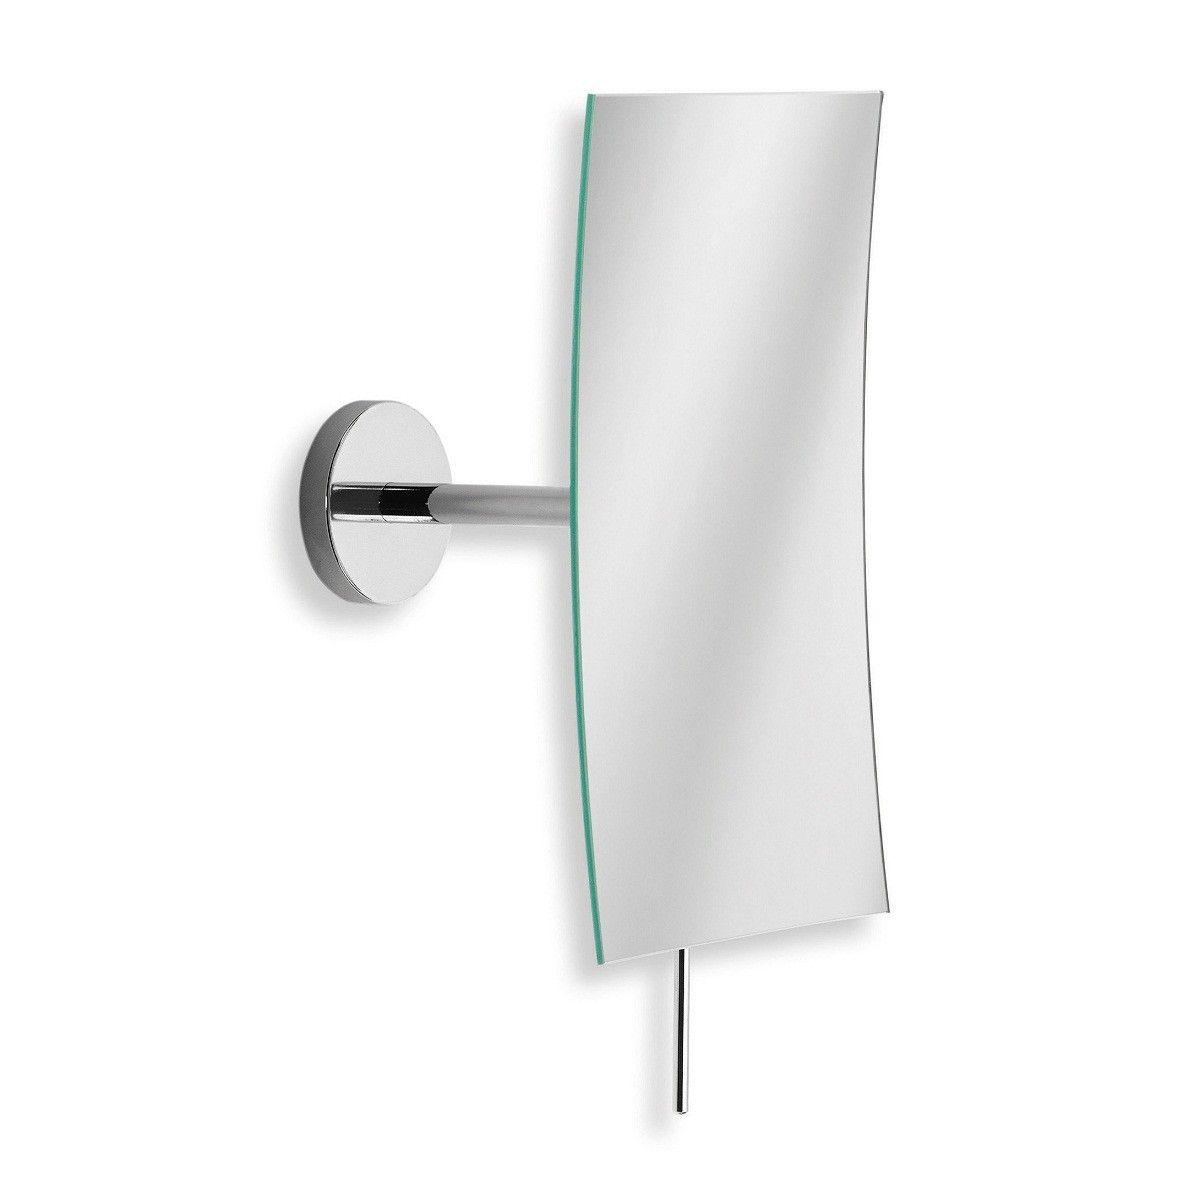 WS Bath Collections Mevedo 5596 Magnifying Mirror 3x From the Mevedo ...